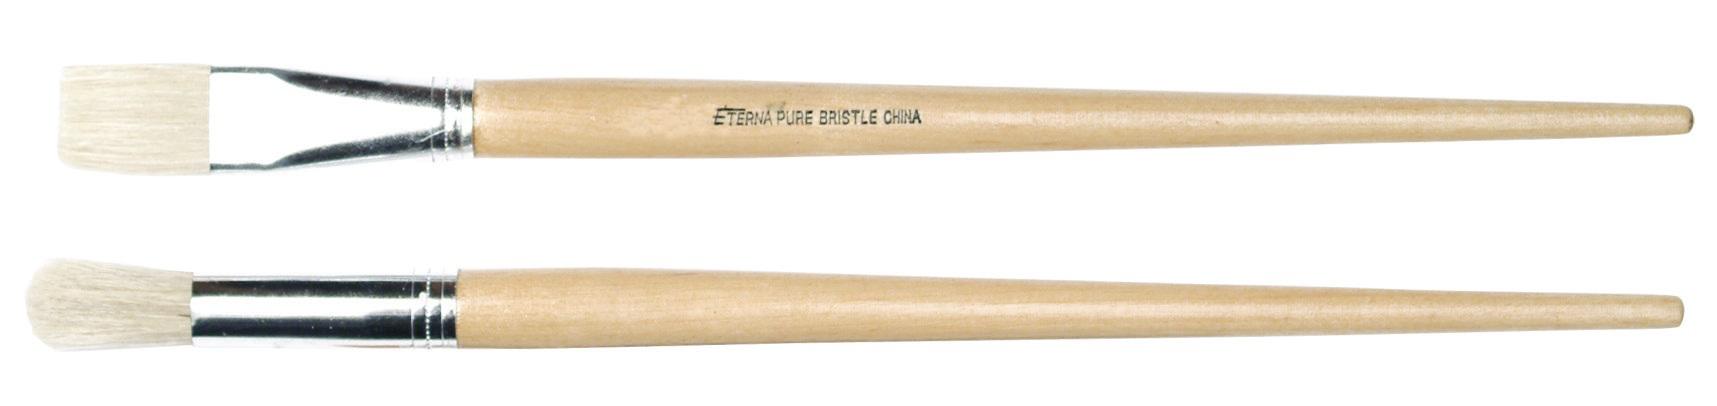 No.7 Flat Hog Brush